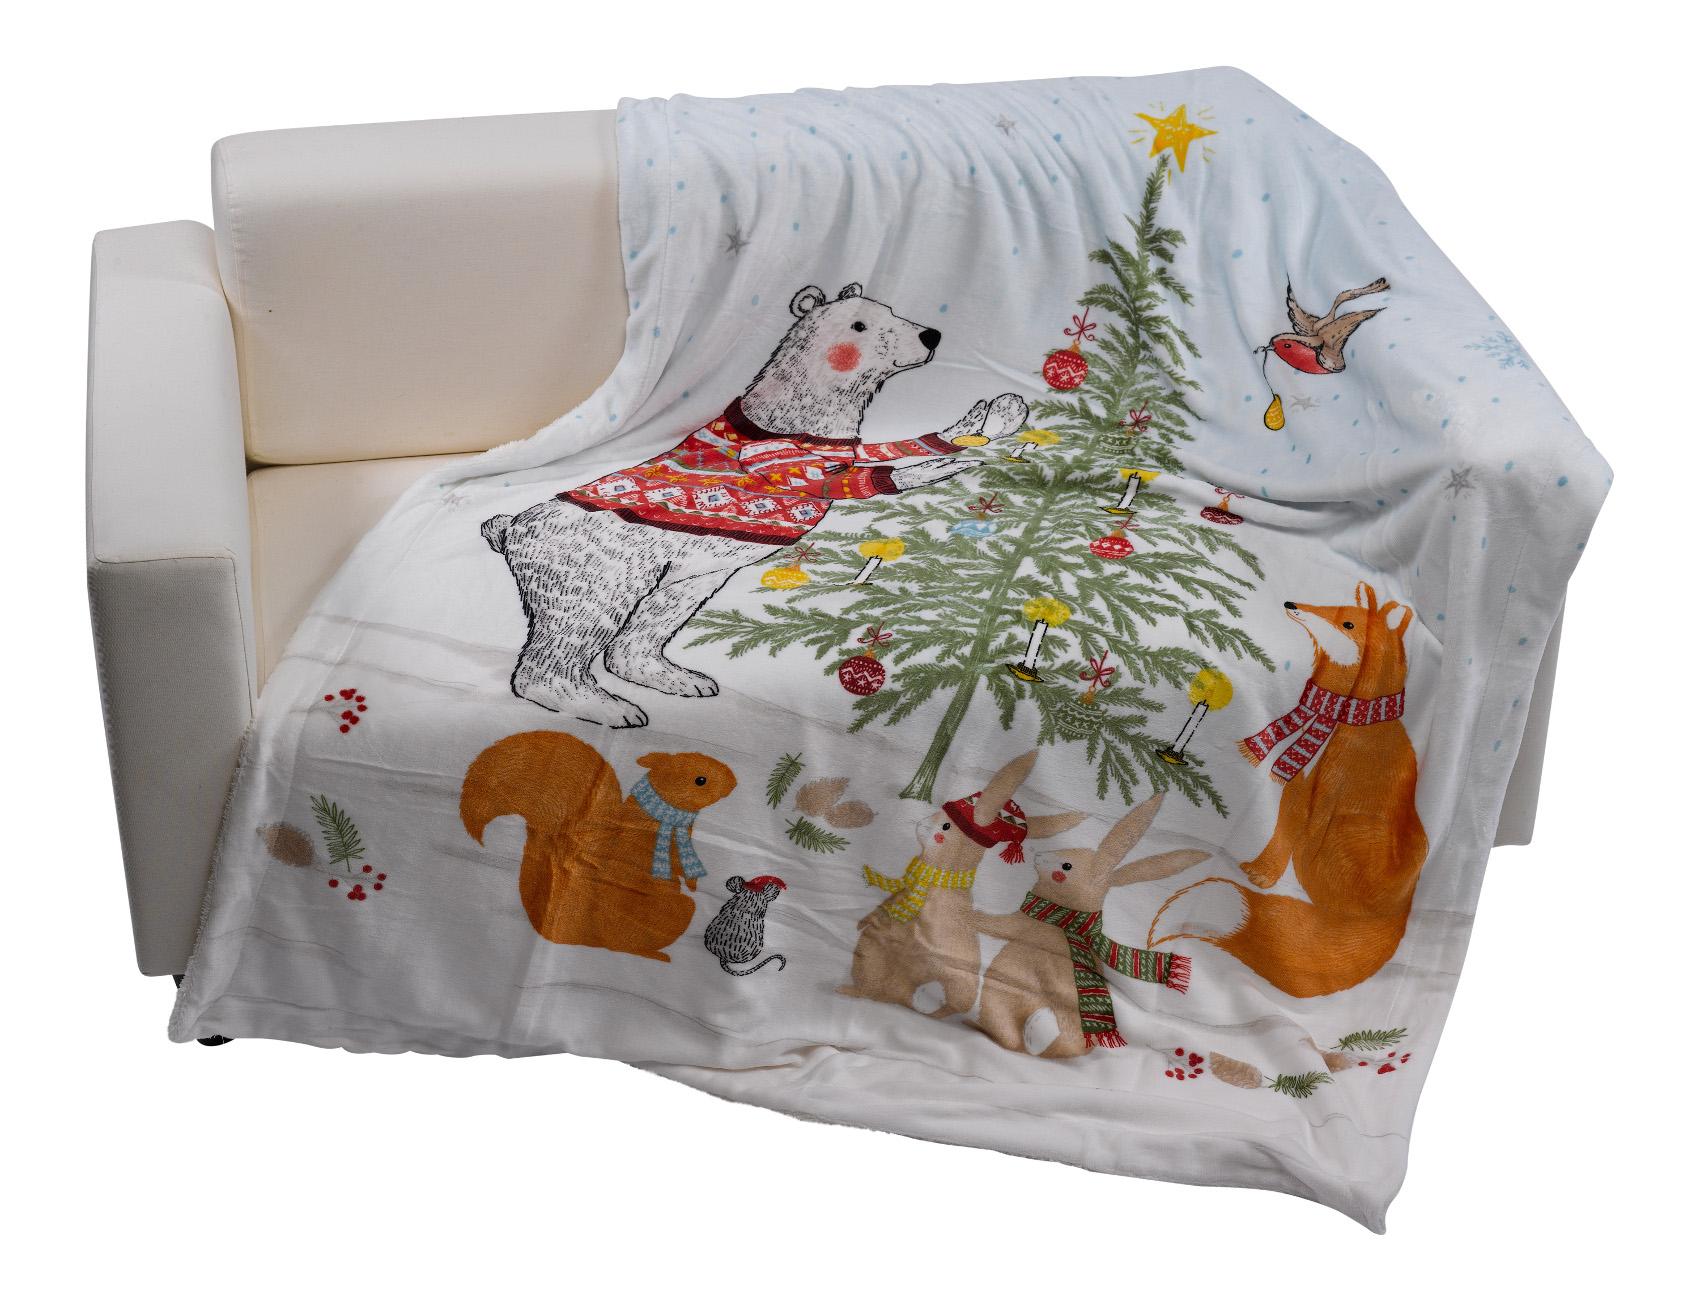 Christmas sofa throws sofa the honoroak for Sofa bed for xmas